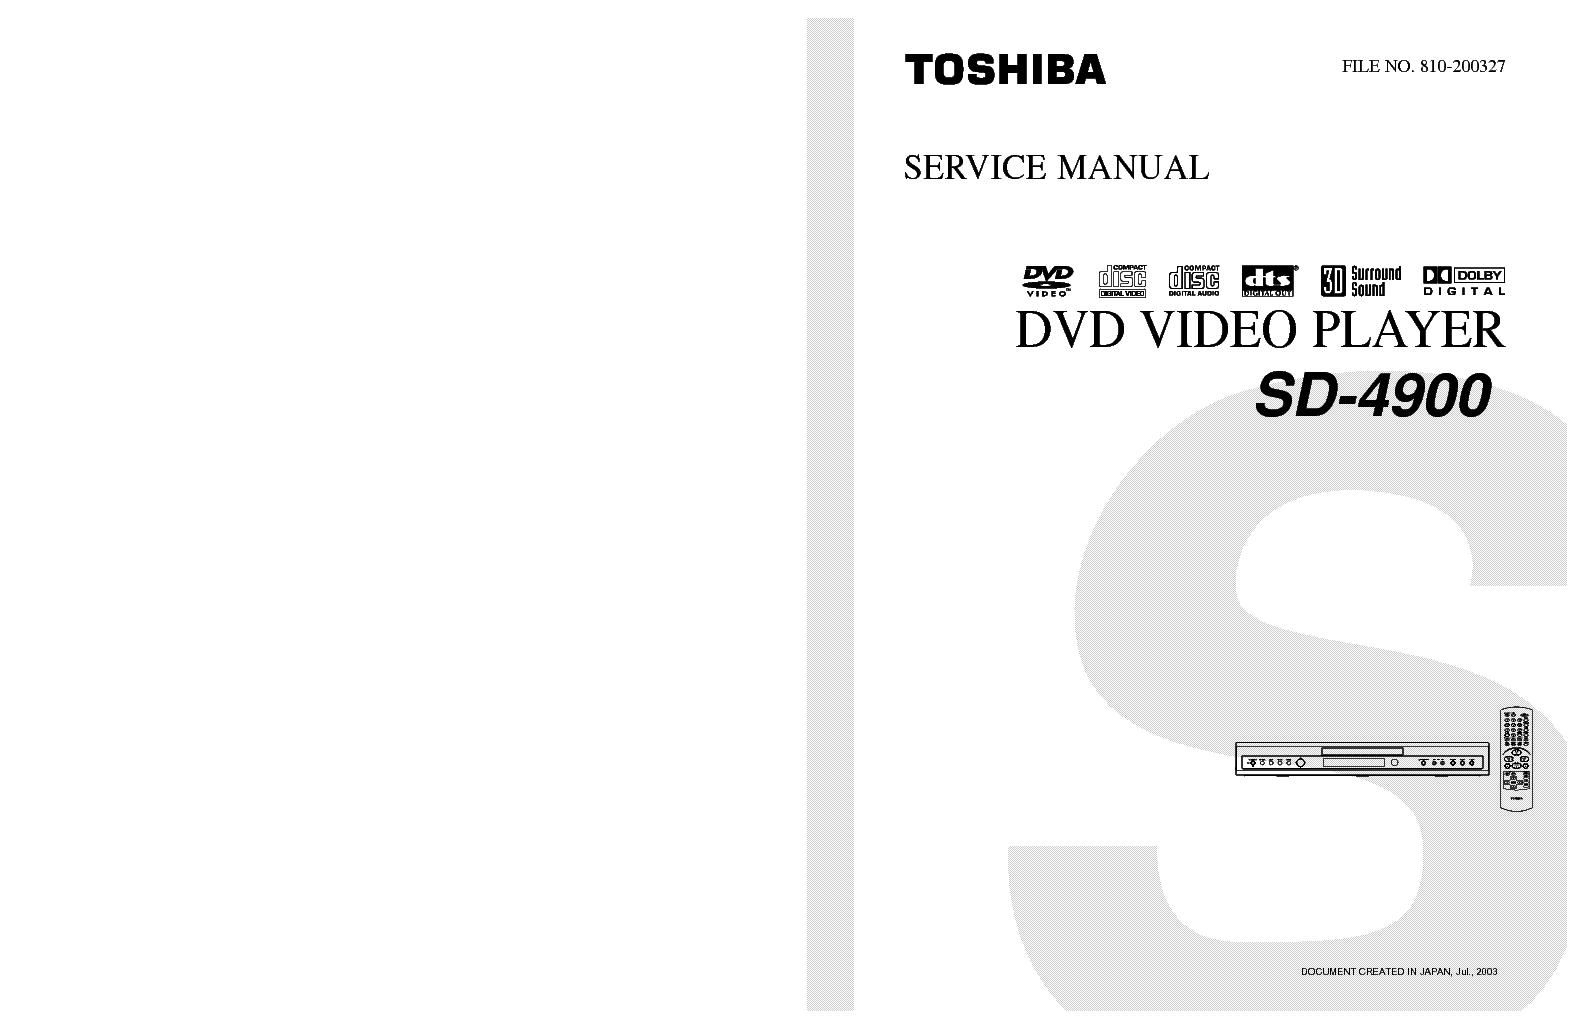 toshiba sd 4900 sm service manual download schematics eeprom rh elektrotanya com Toshiba TV Owners Manual For Toshiba TV Manuals